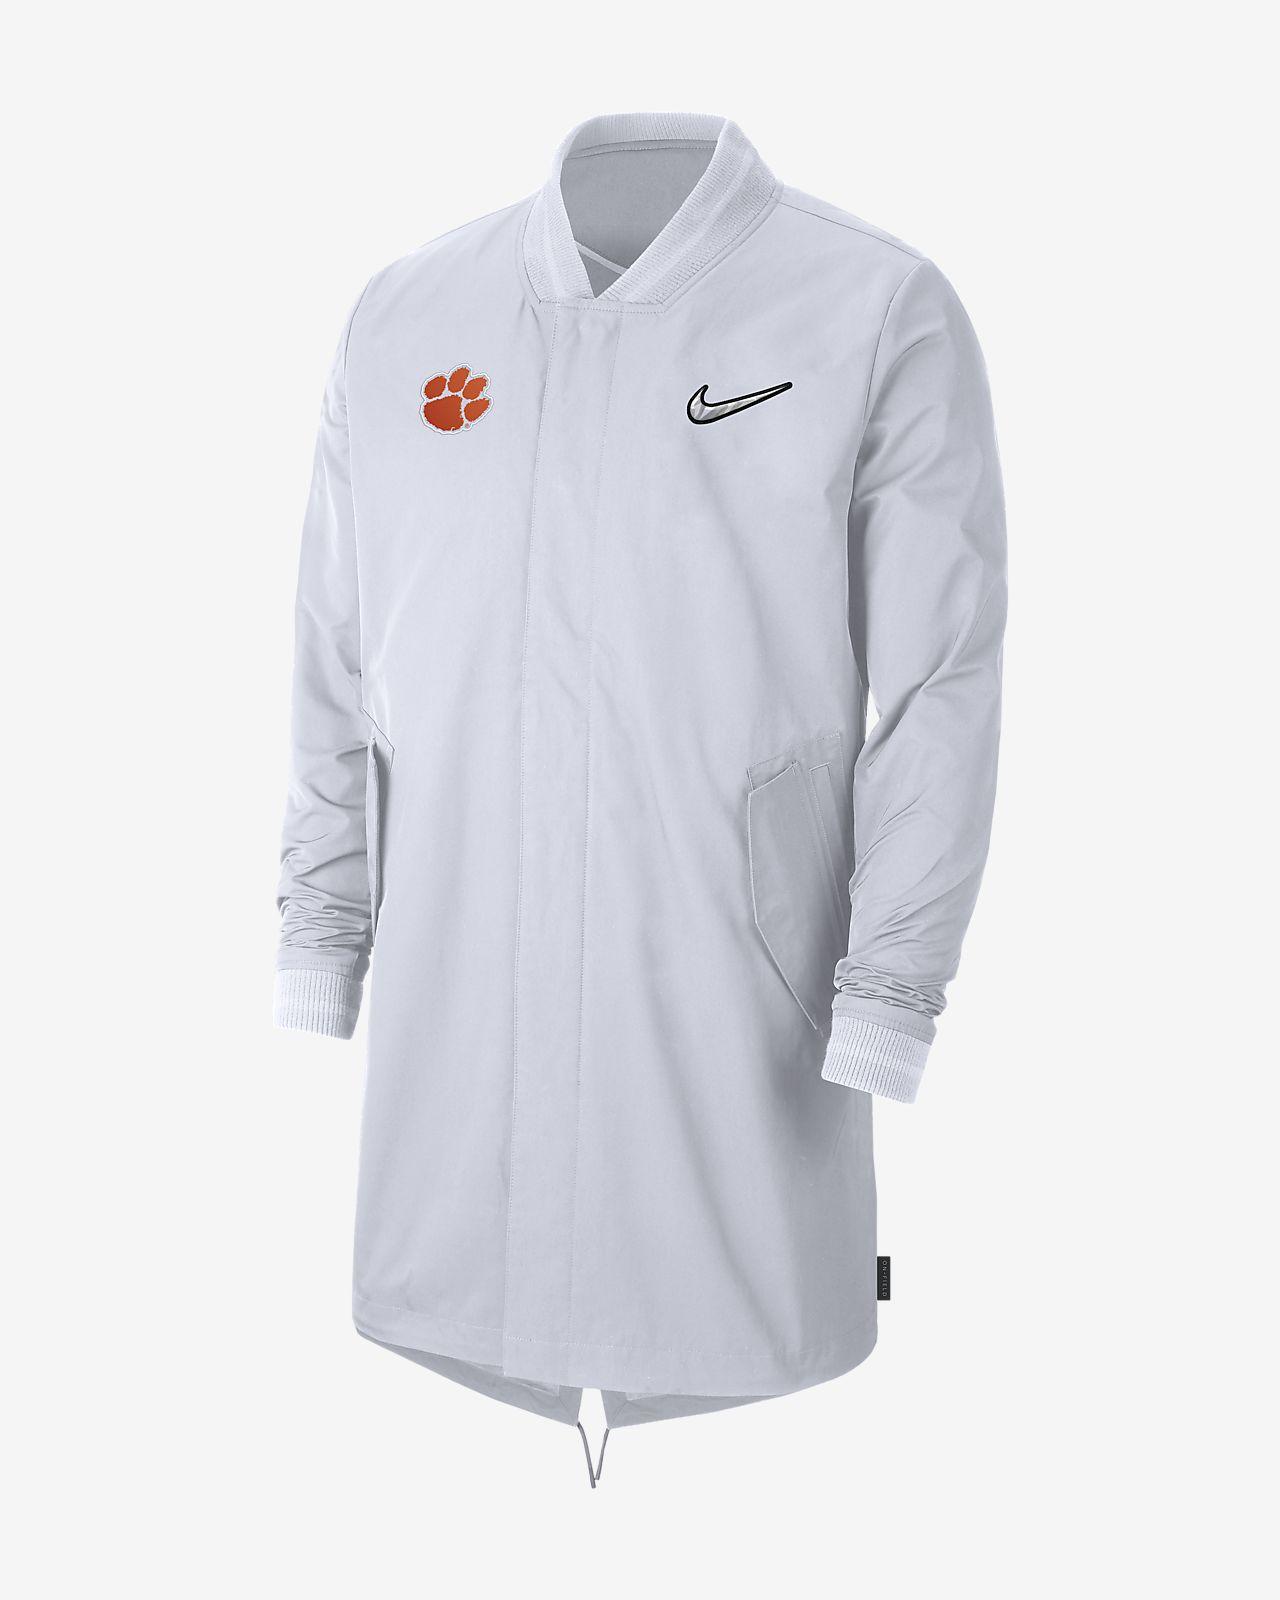 Nike College Player (Clemson) Men's Jacket